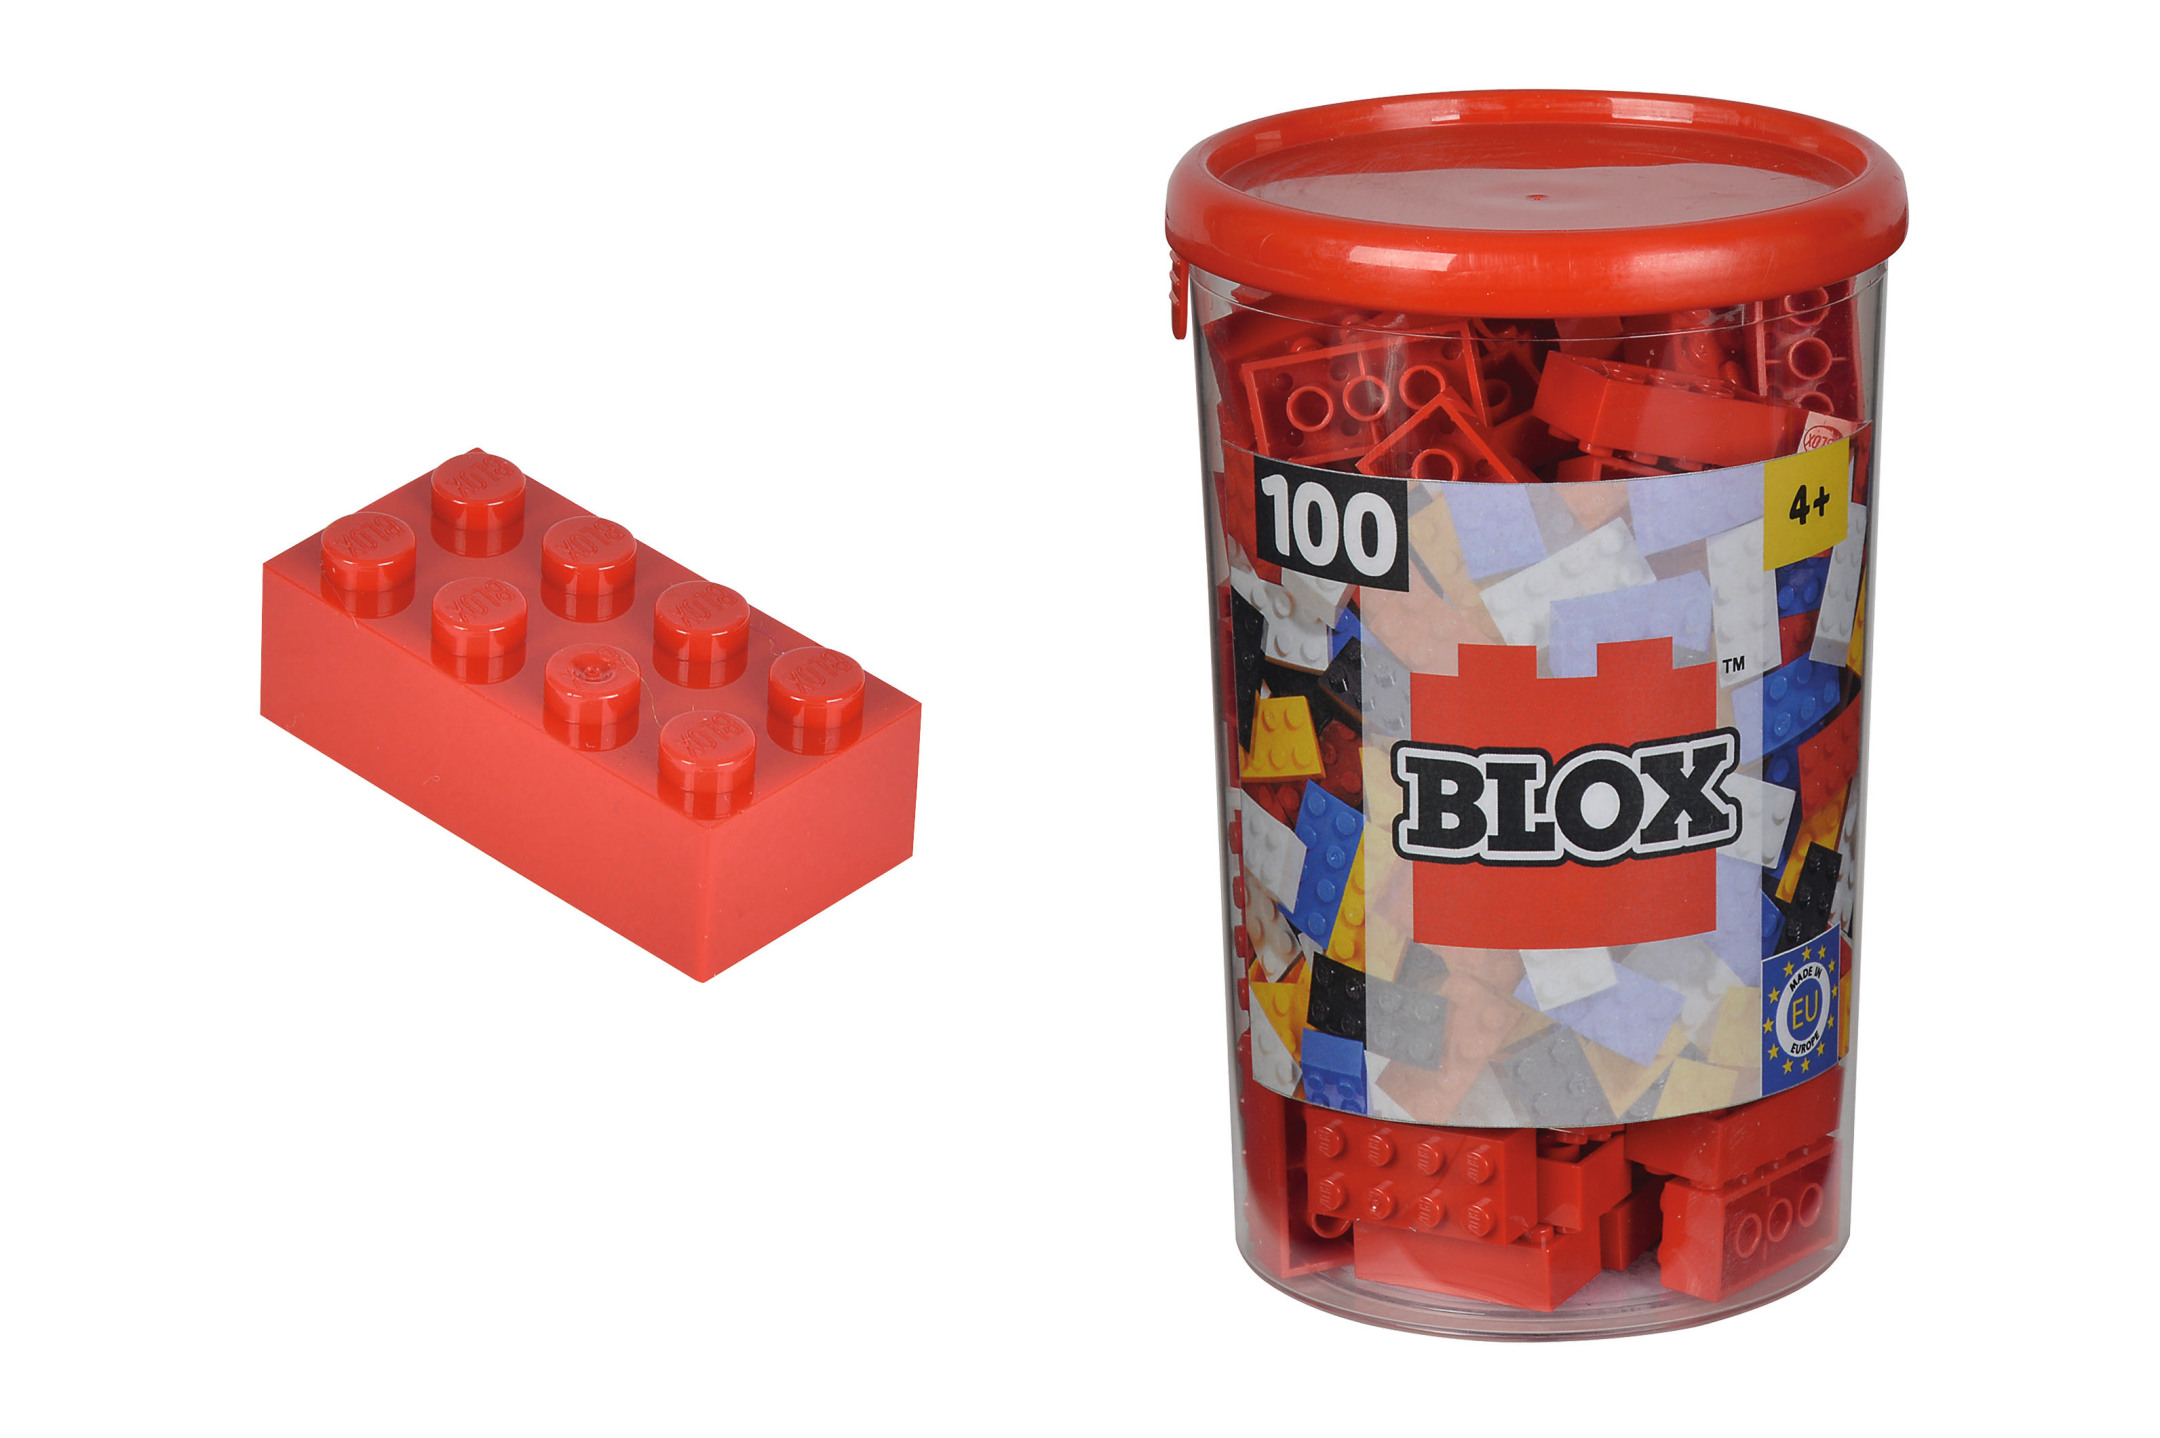 Blox 100 rote Steine in Dose